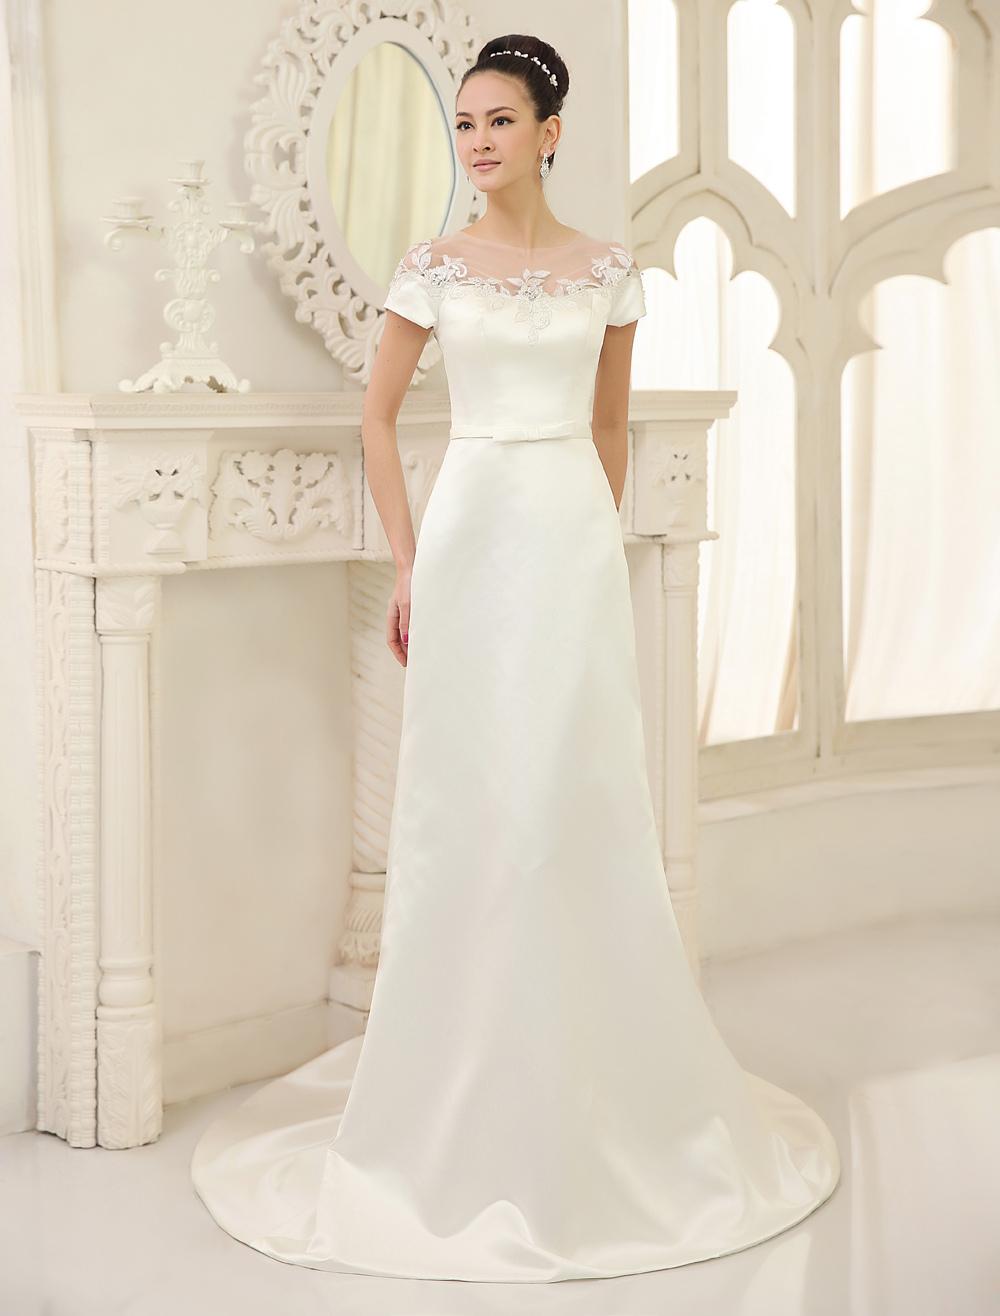 Ivory Sheath Jewel Neck Bow Court Train Satin Wedding Dress For Bride  Milanoo